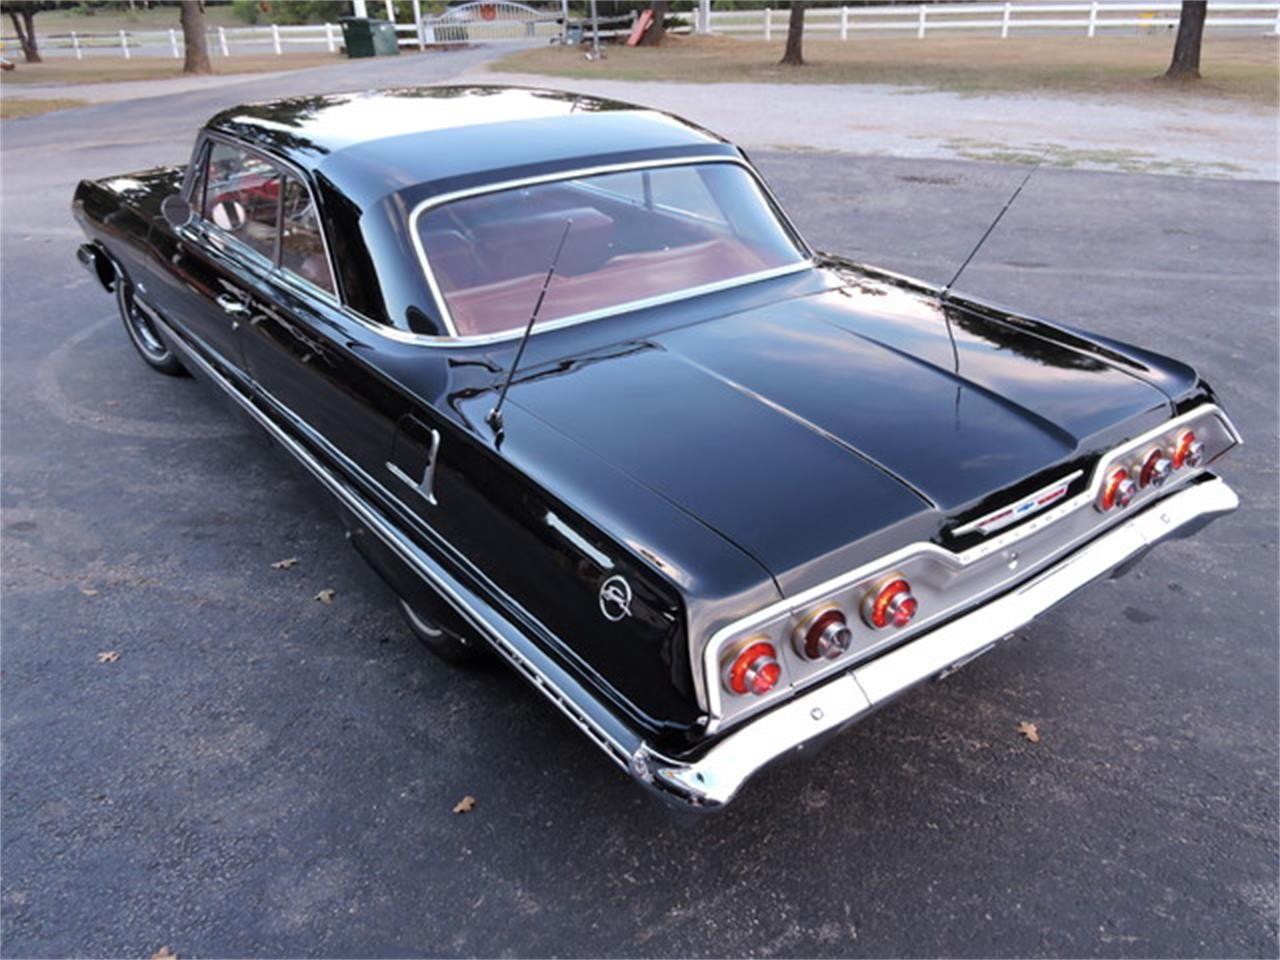 Photo 3 Chevrolet Impala Impala Chevrolet